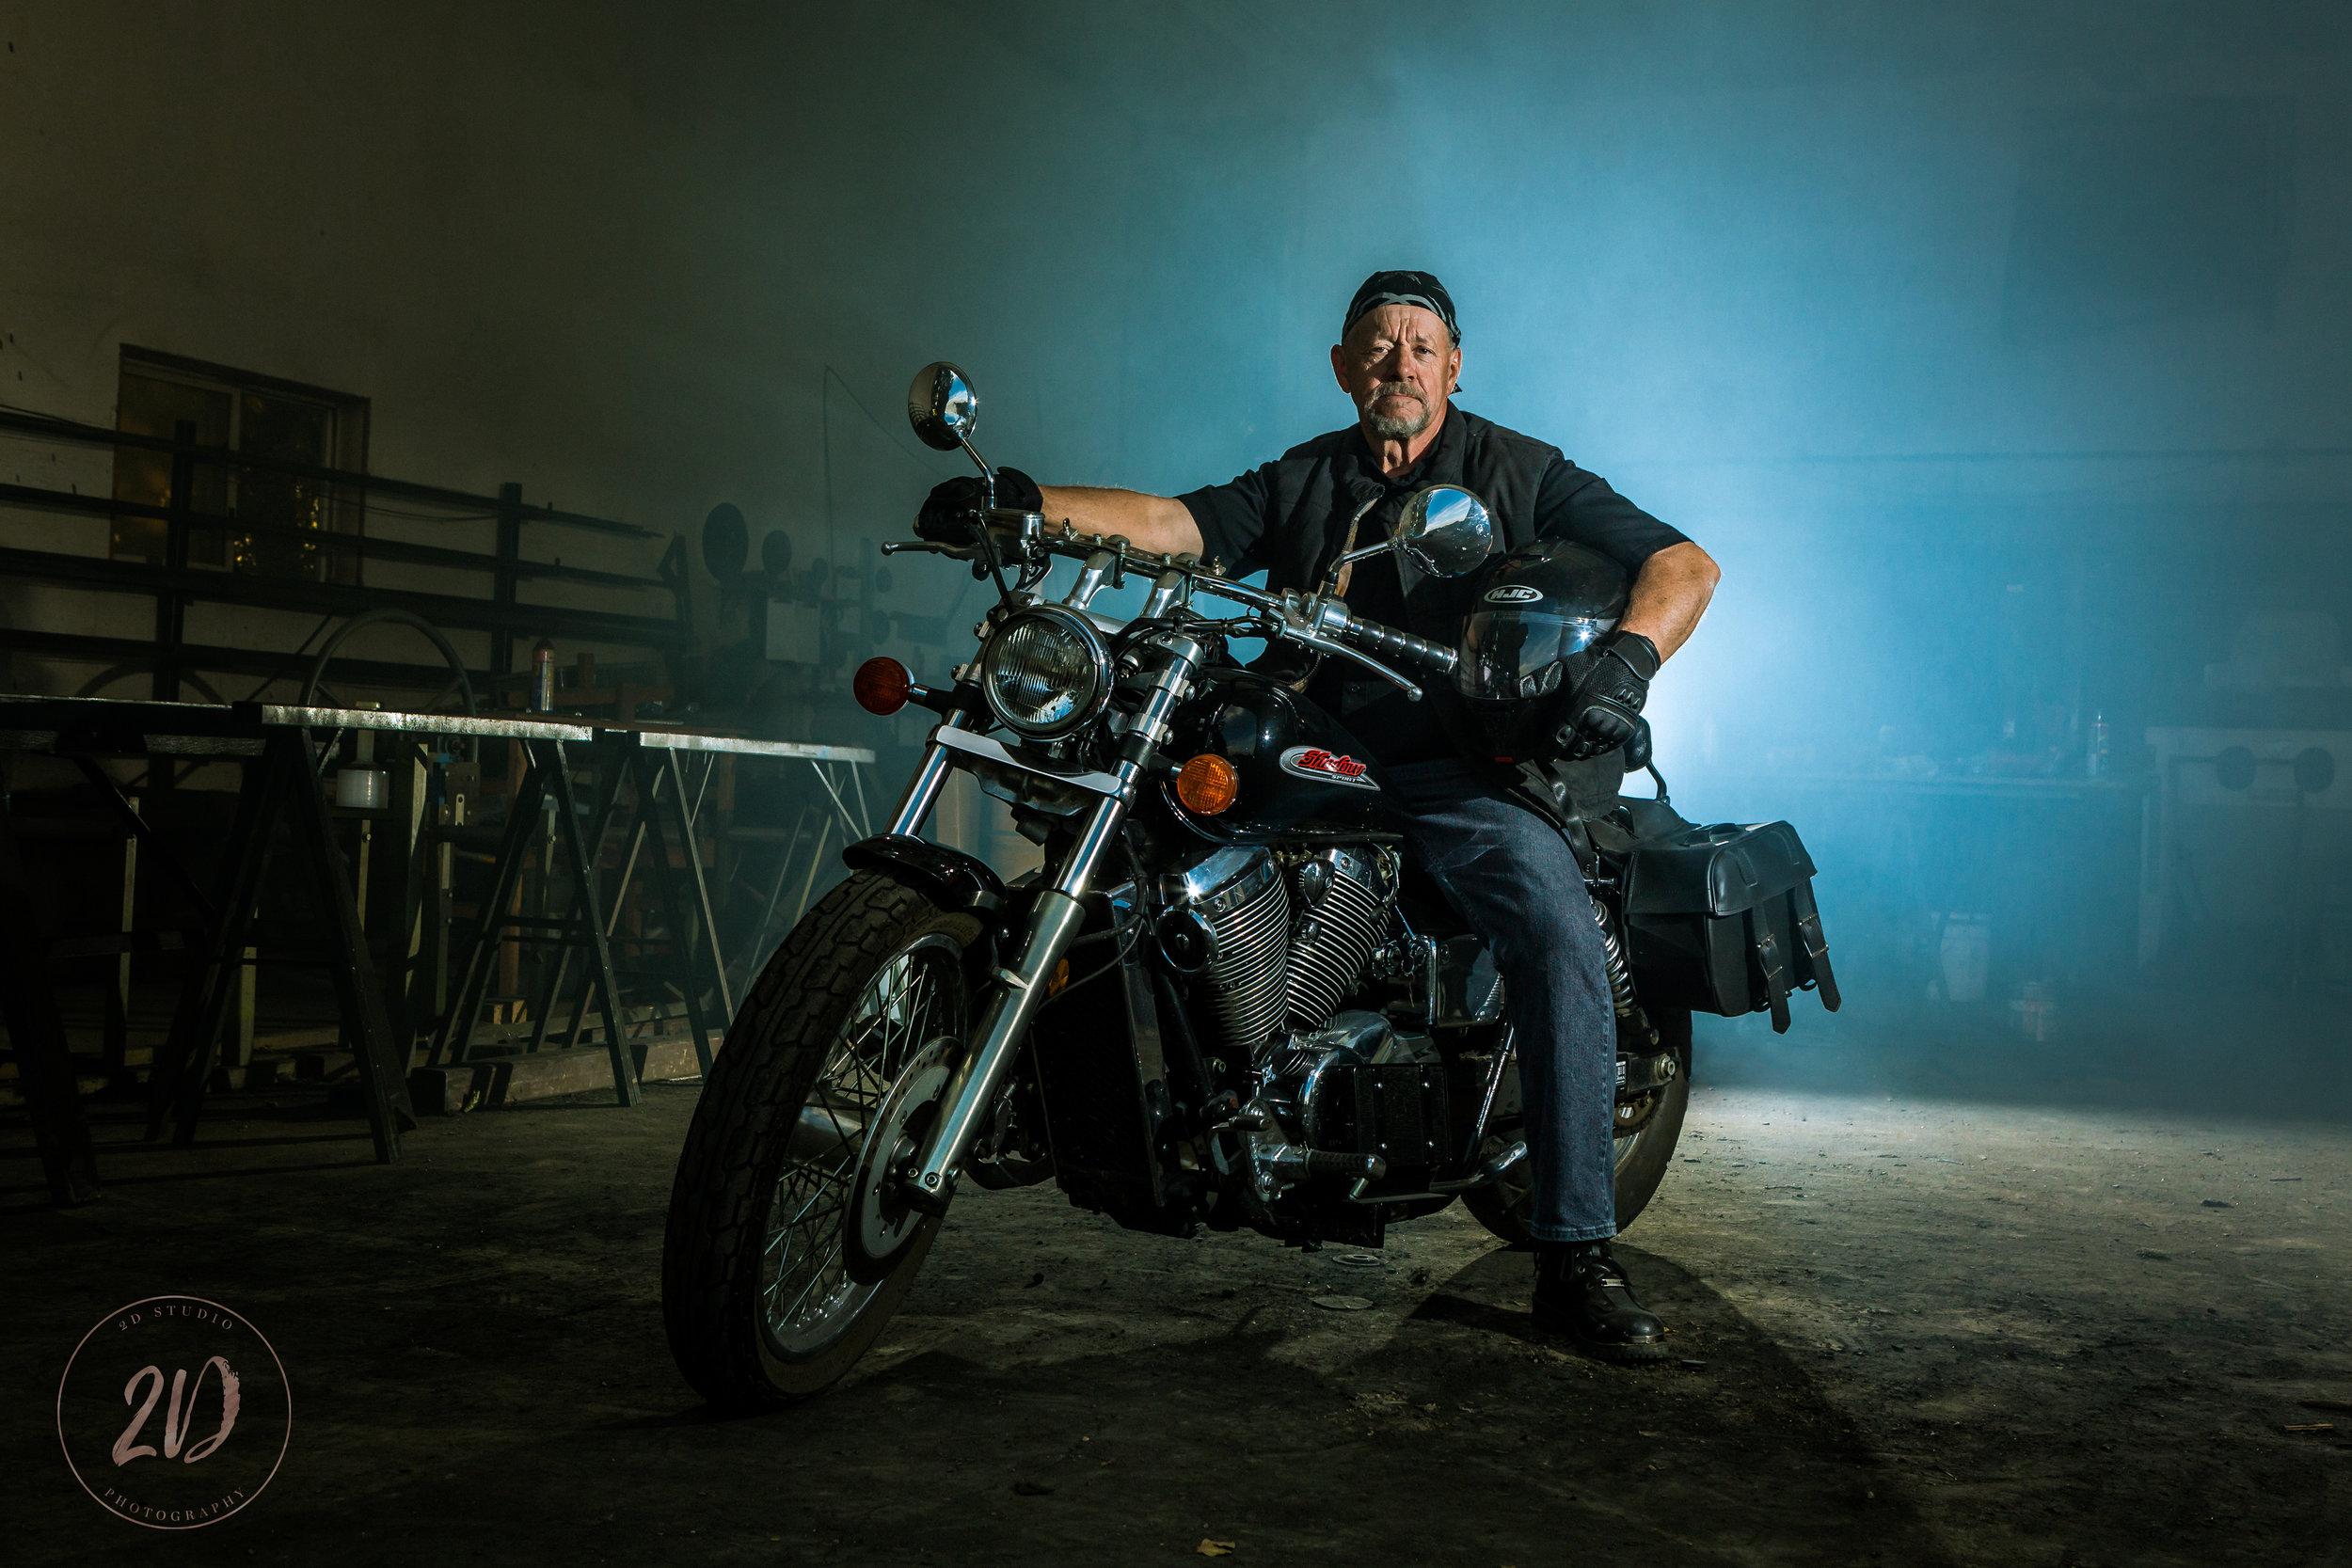 Portrait_Shop_Environmental_Coaldale_Lethbridge_Motorcycle_Smoke